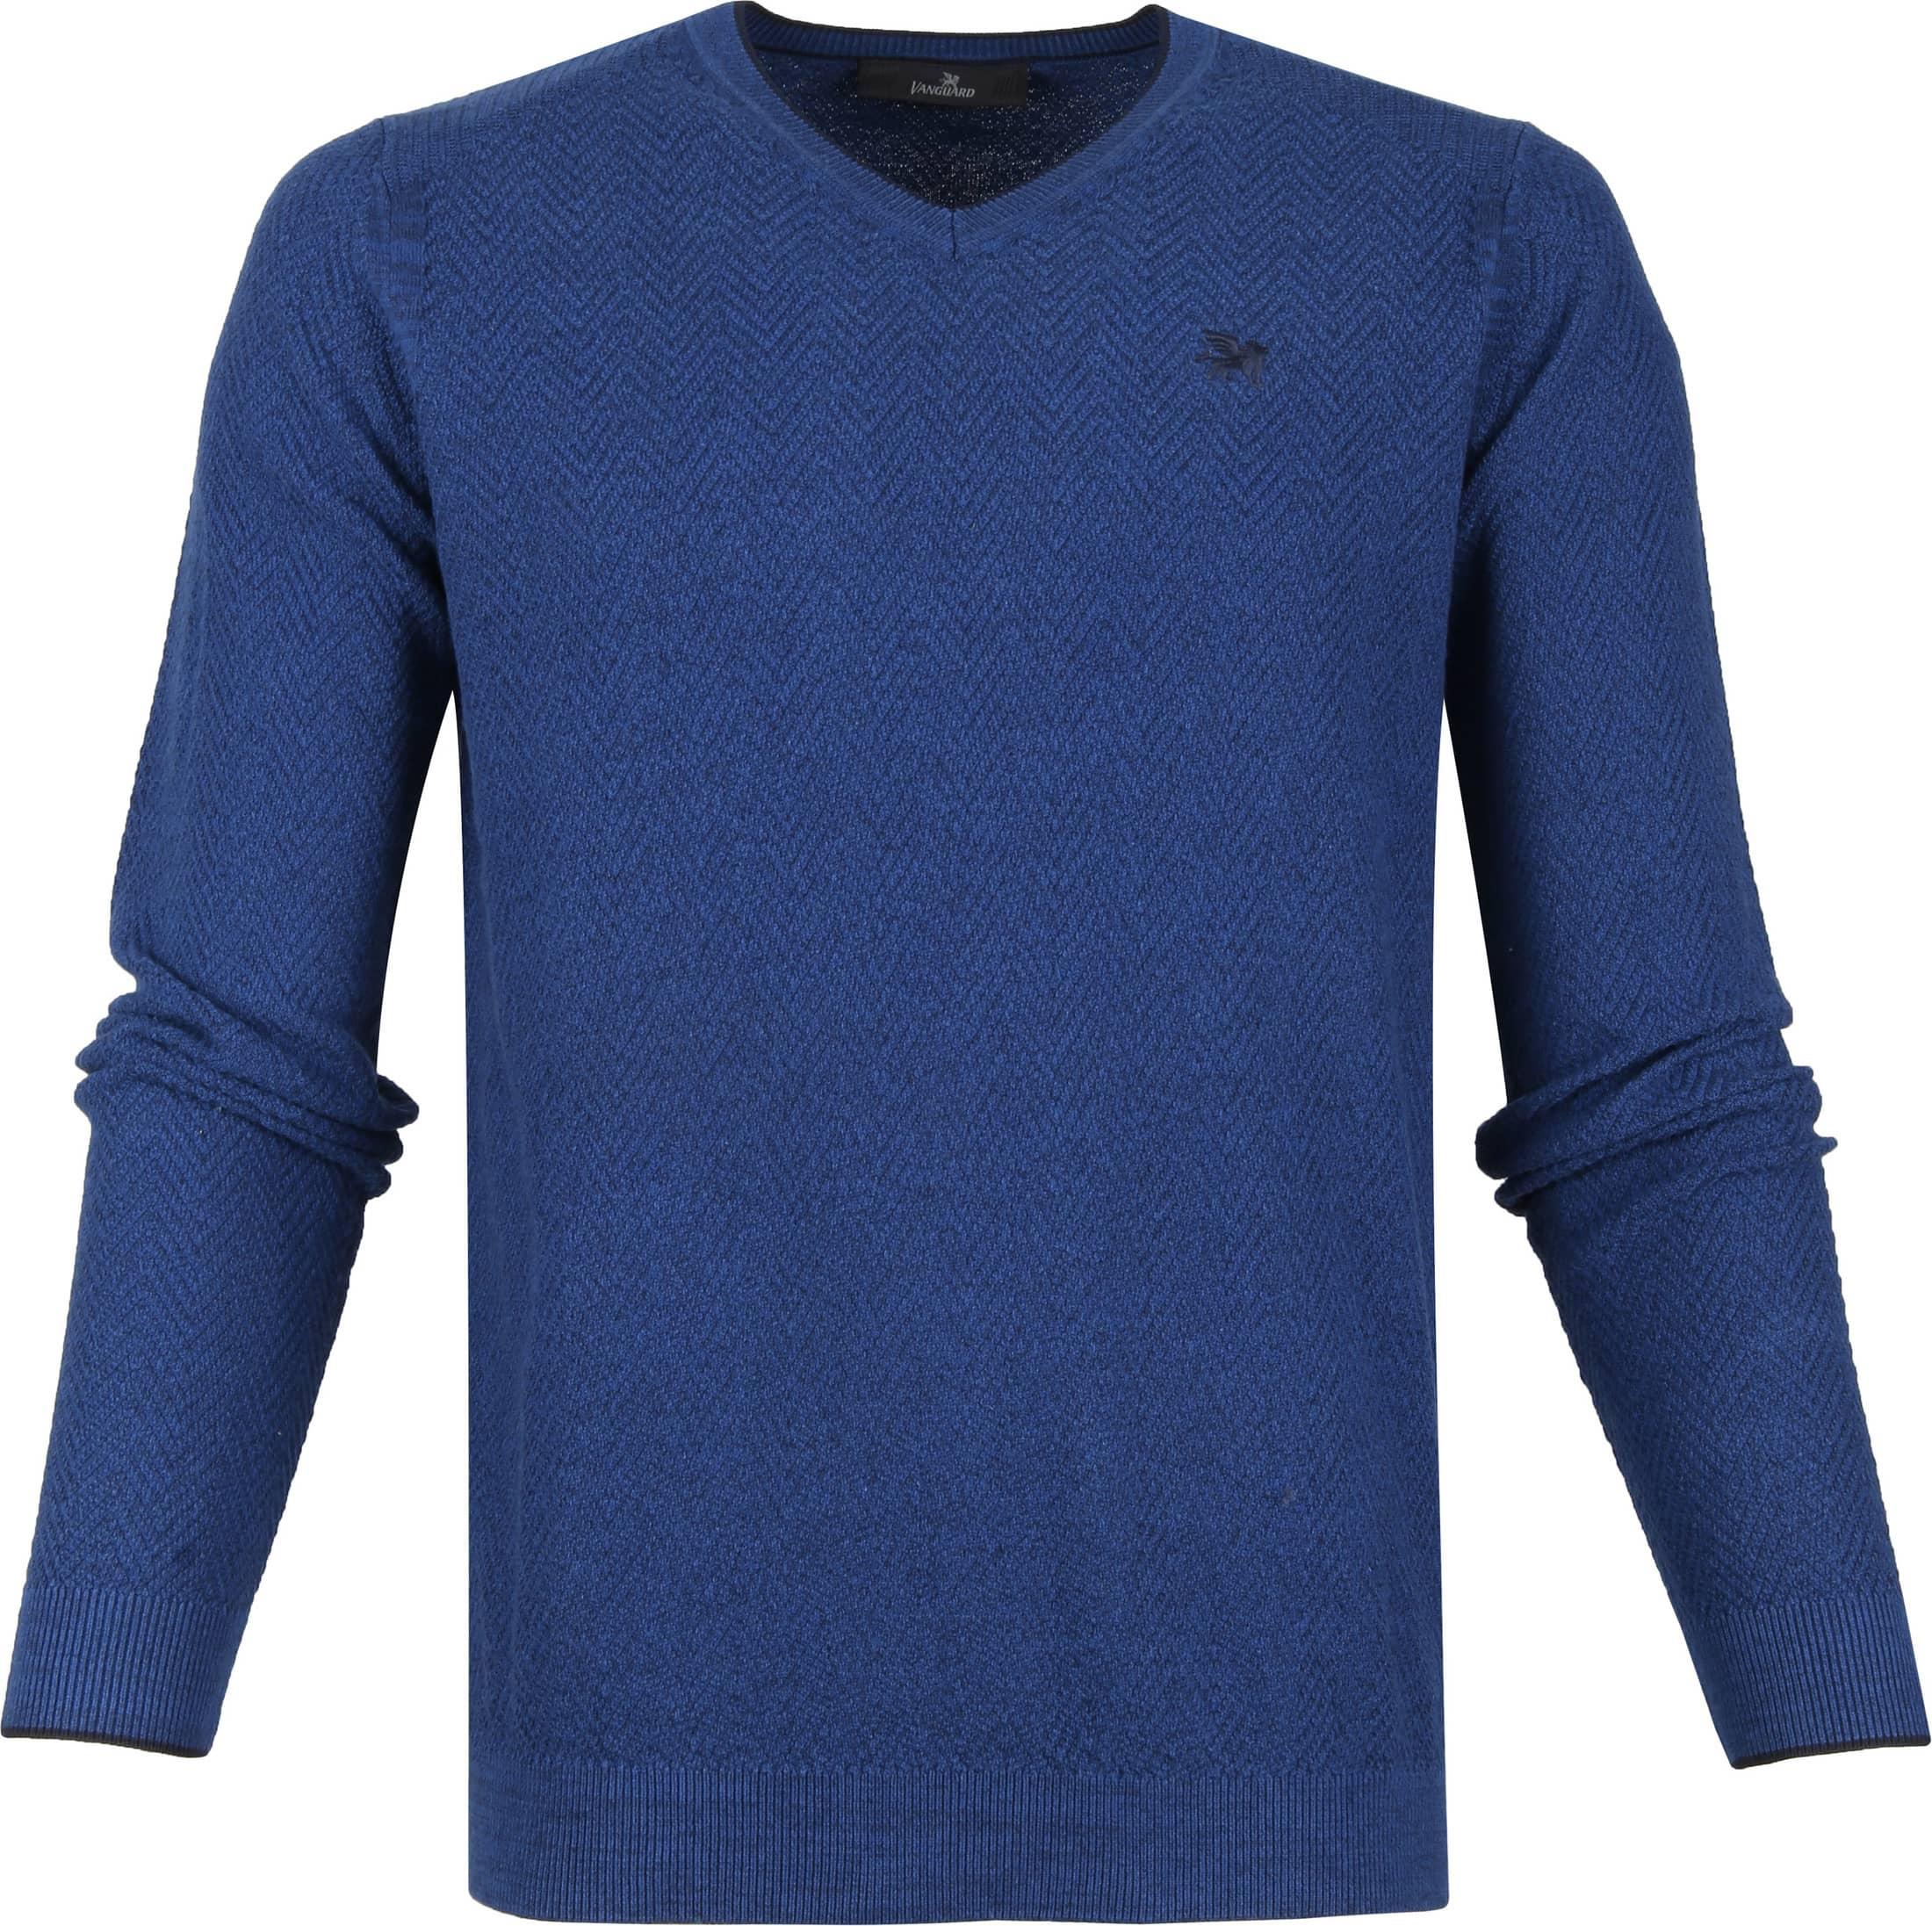 Vanguard Pullover Blauw foto 0